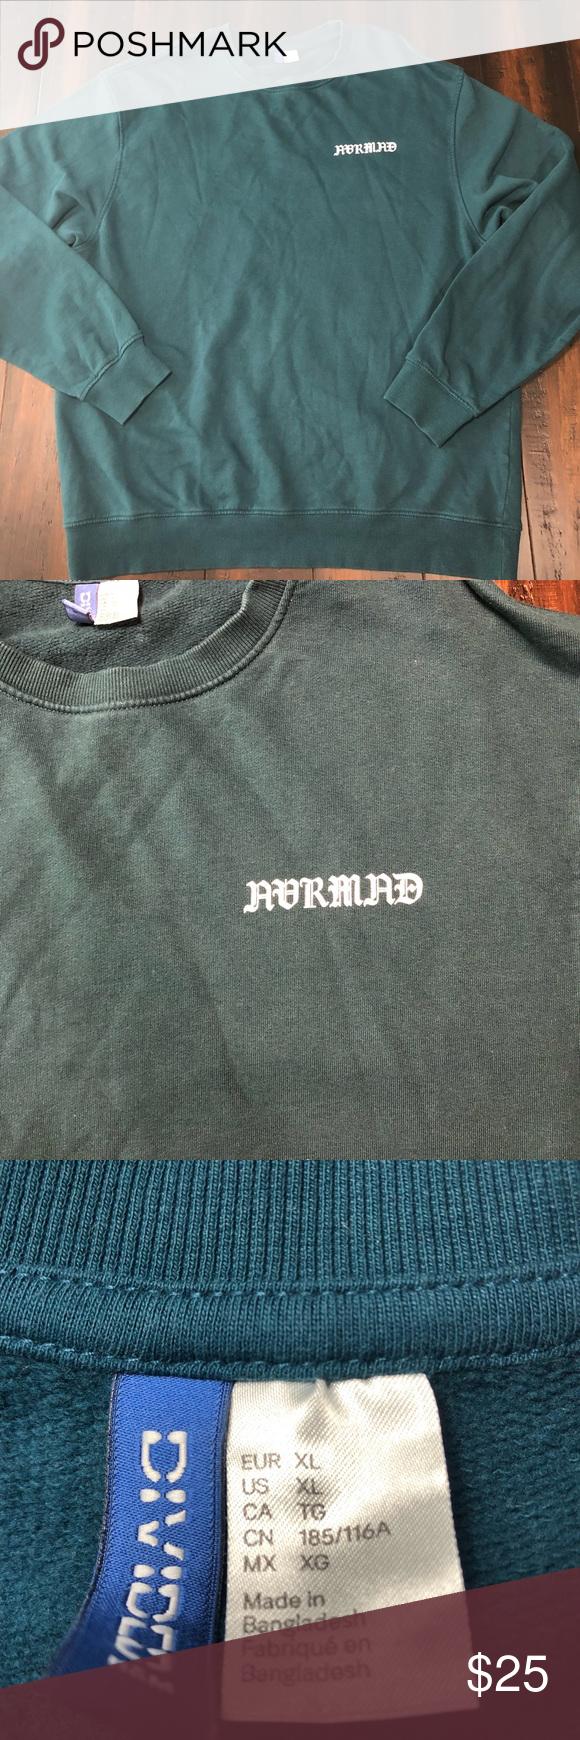 H M Avrmad Crewneck Sweatshirt Crew Neck Sweatshirt Branded Sweatshirts Sweatshirts [ 1740 x 580 Pixel ]